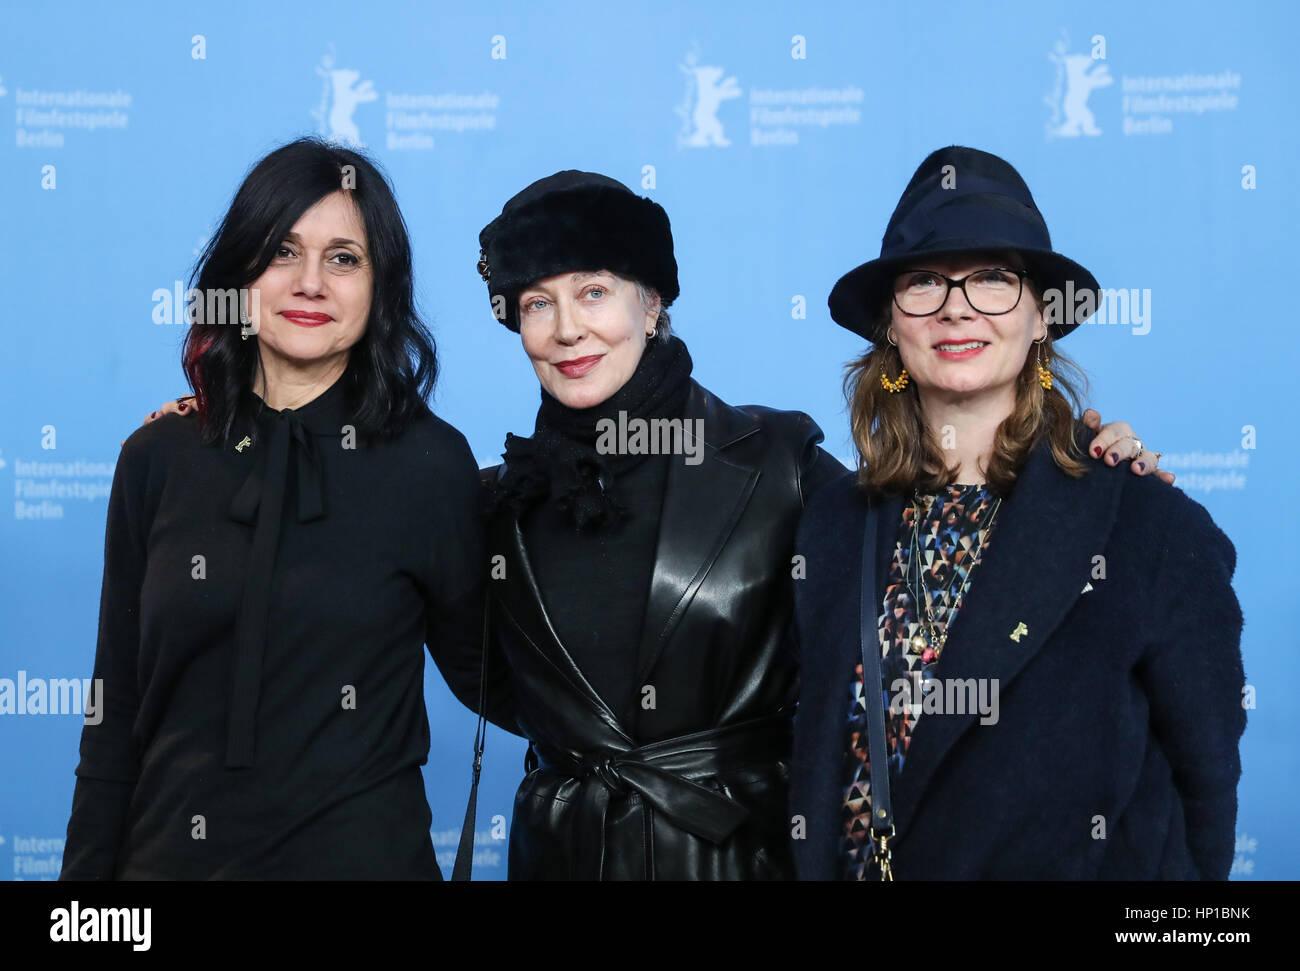 Berlin, Germany. 16th Feb, 2017. Italian film costume designer Milena Canonero (C) attends a photocall during the - Stock Image